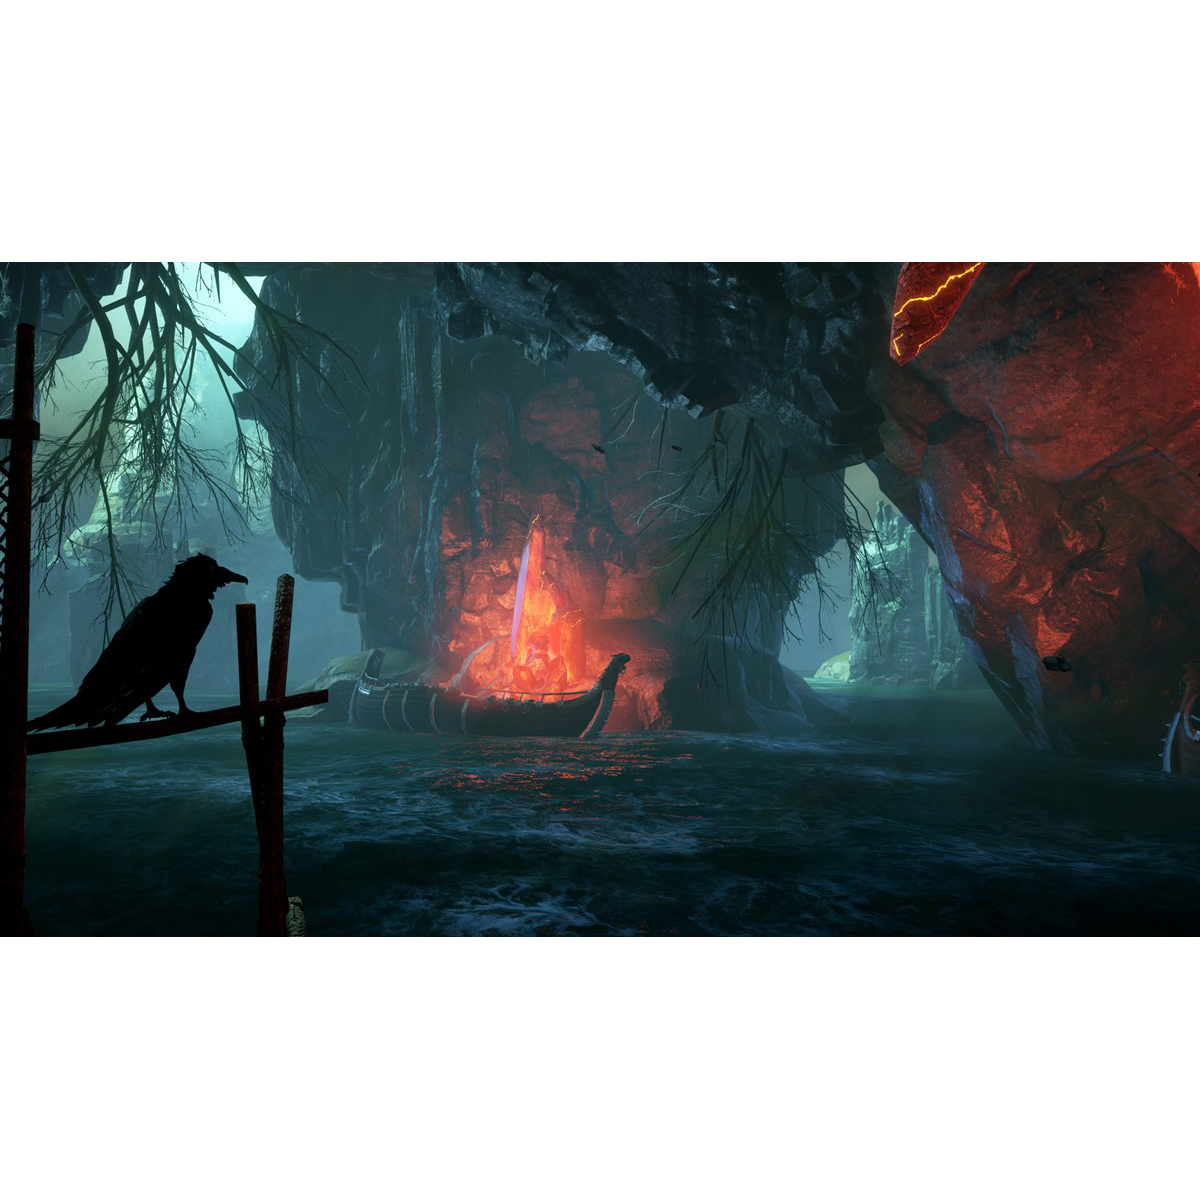 Joc Dragon Age: Inquisition pentru PlayStation 3 15